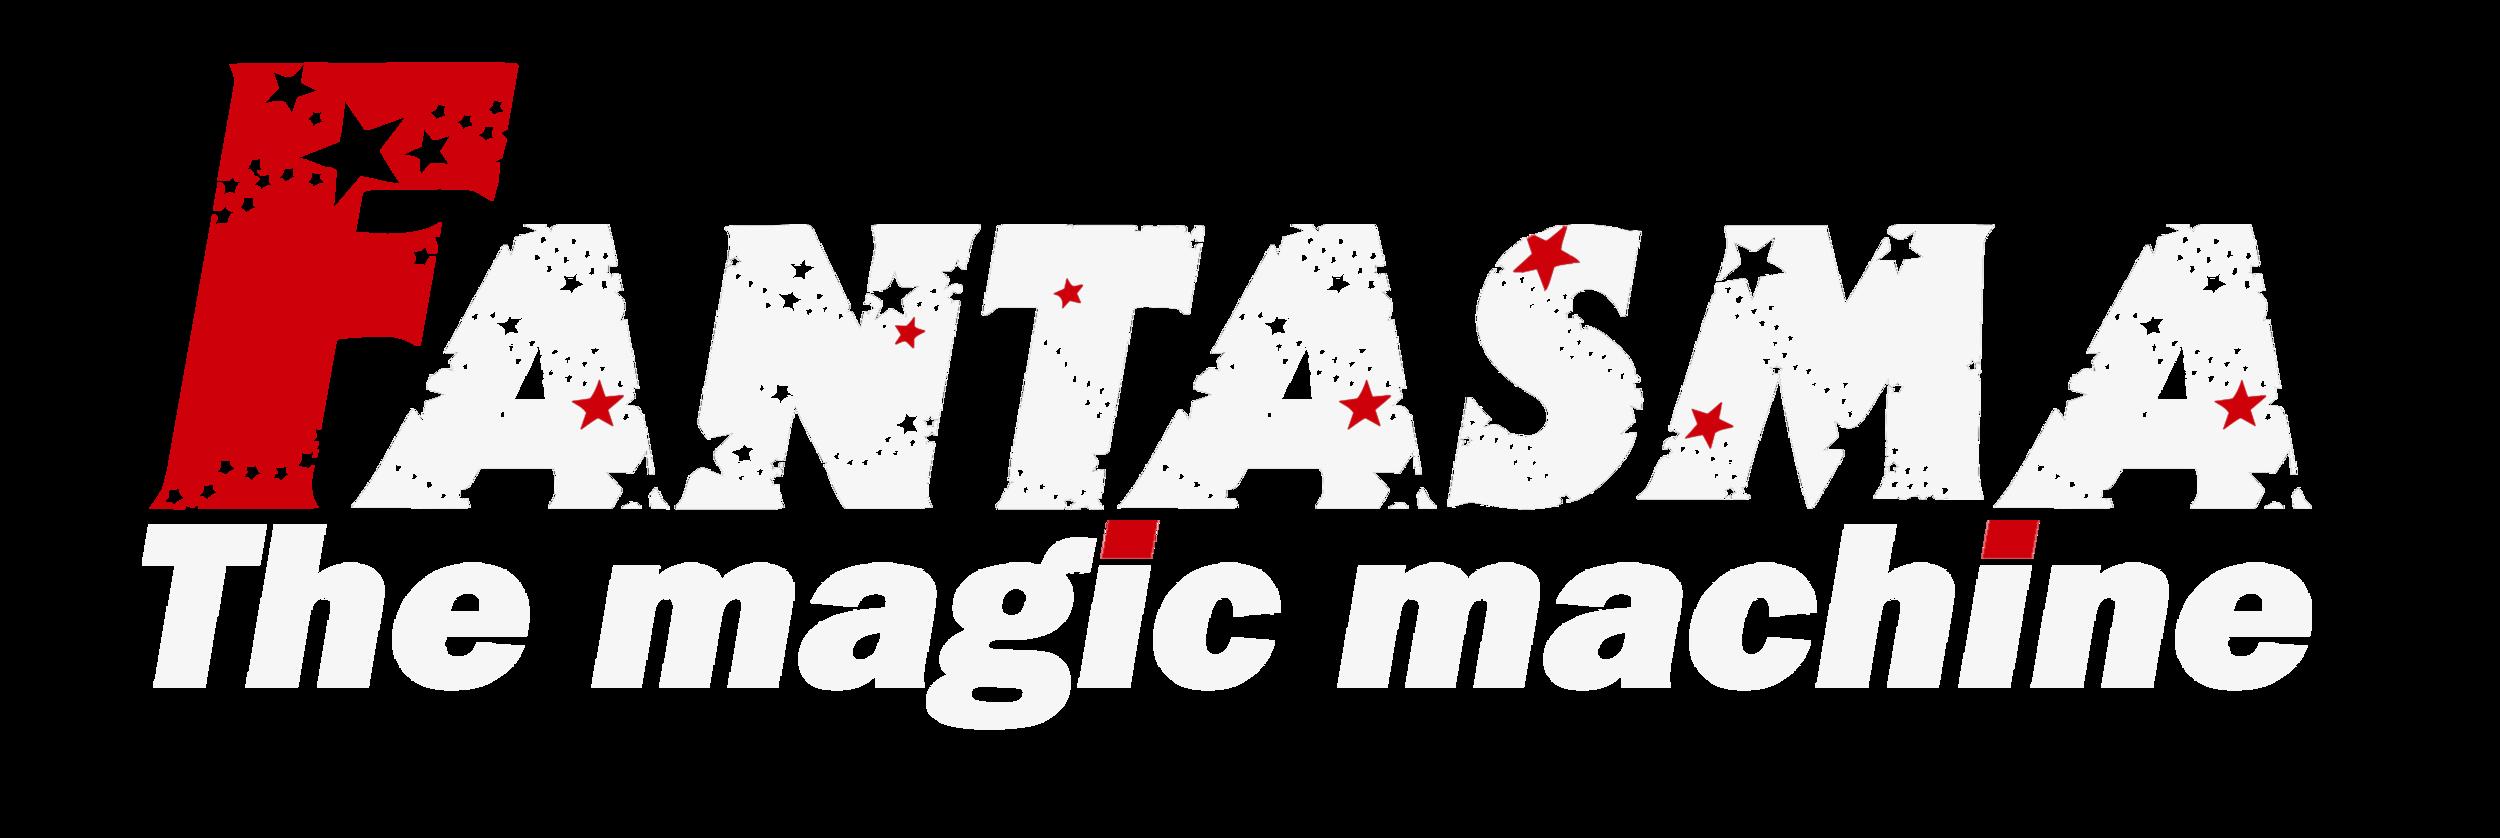 Fantasma - Full Size - Strapline - For Dark Background.png